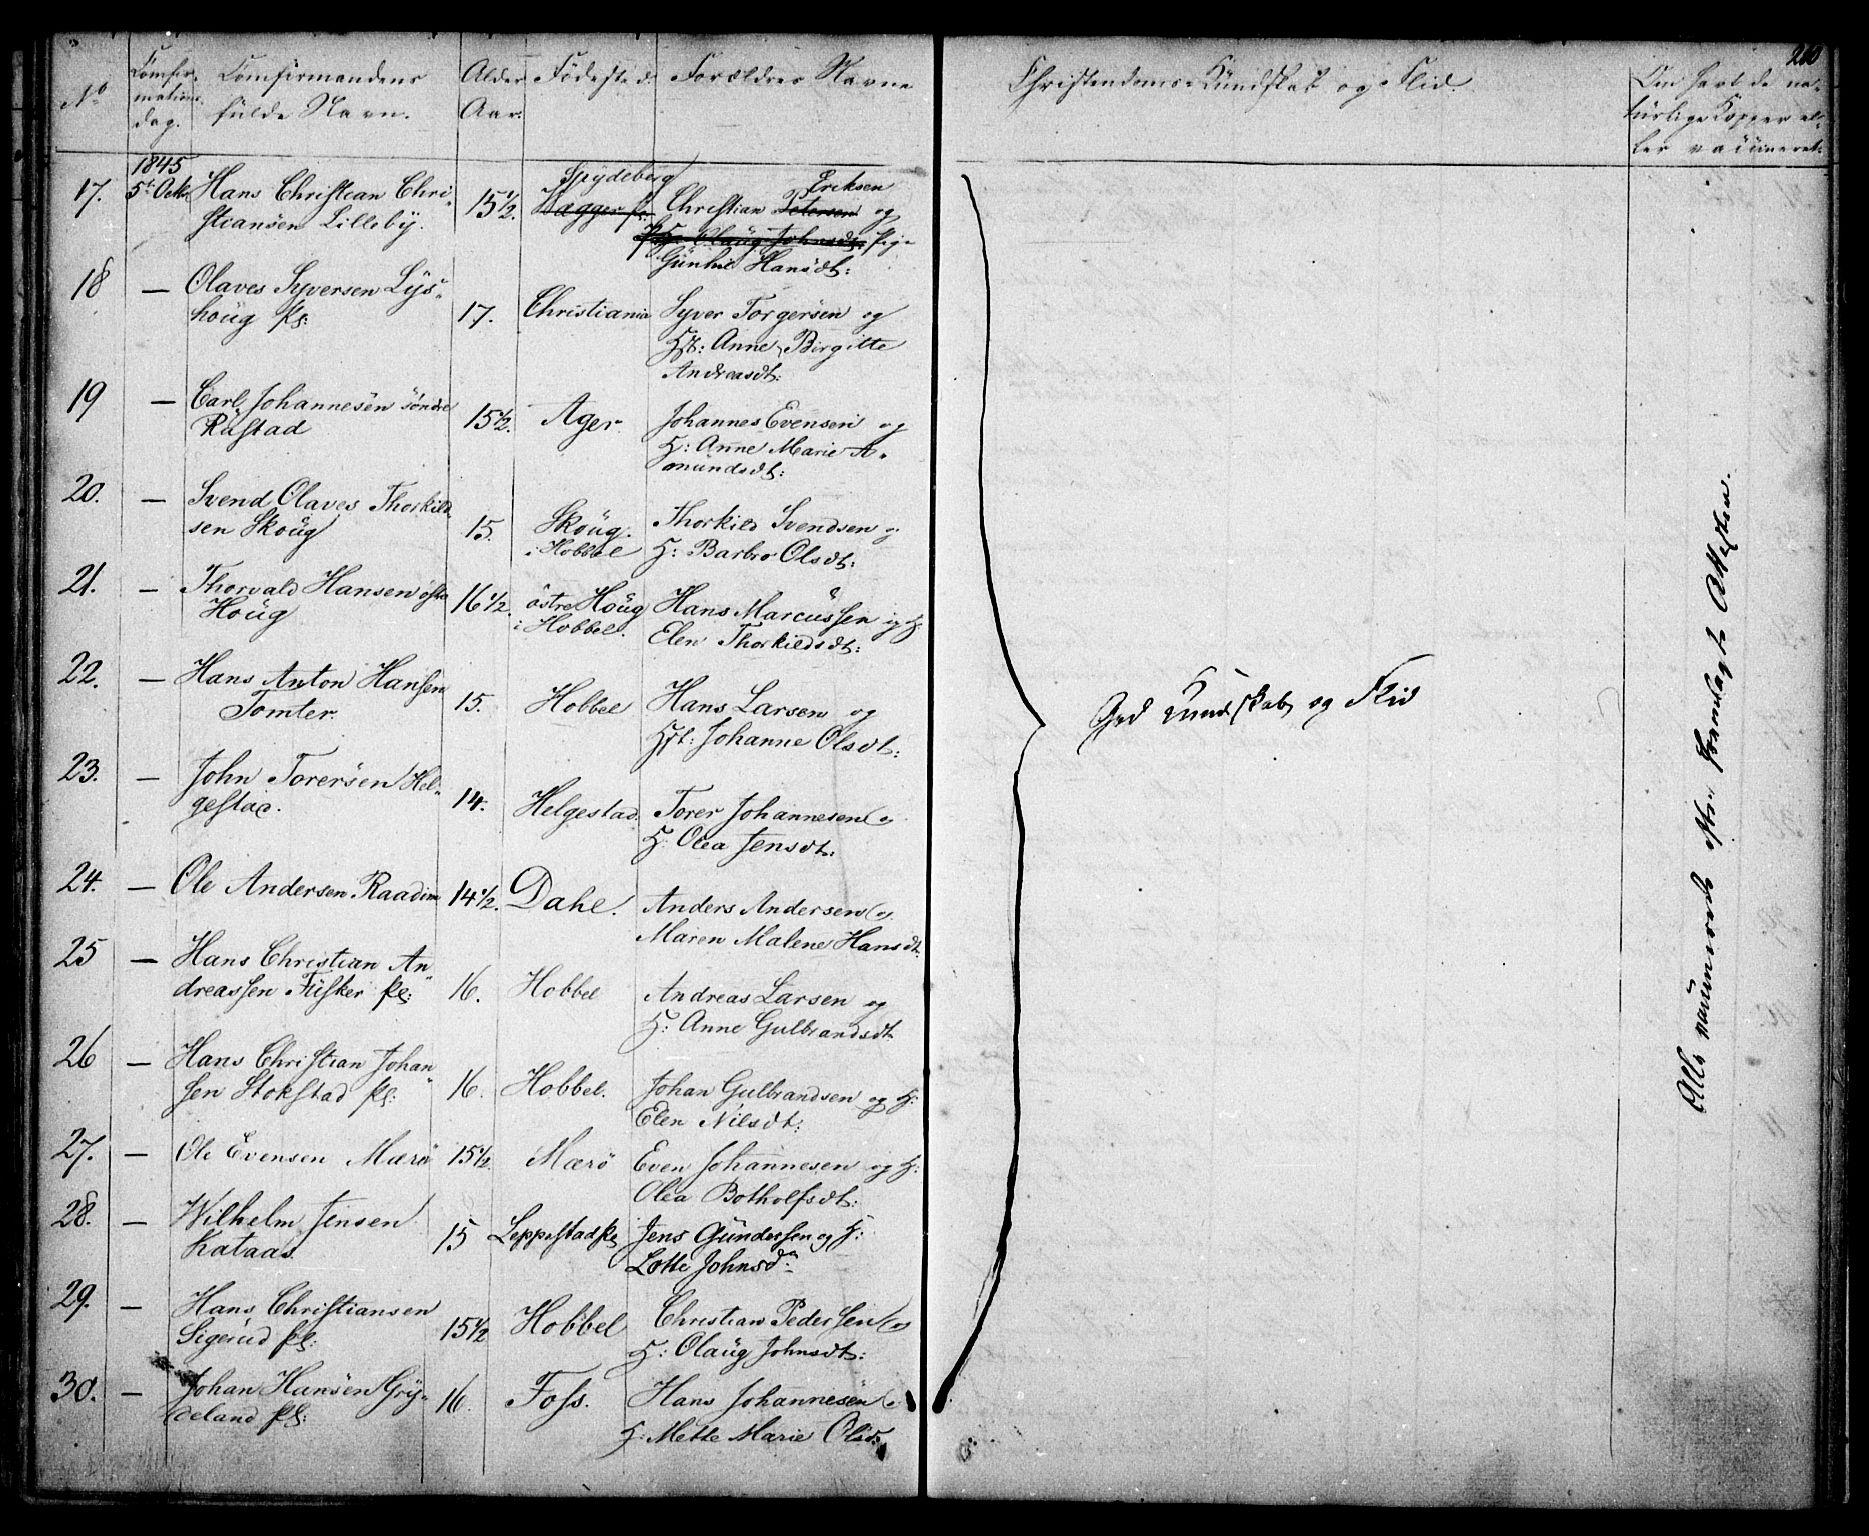 SAO, Kråkstad prestekontor Kirkebøker, F/Fa/L0005: Parish register (official) no. I 5, 1837-1847, p. 210